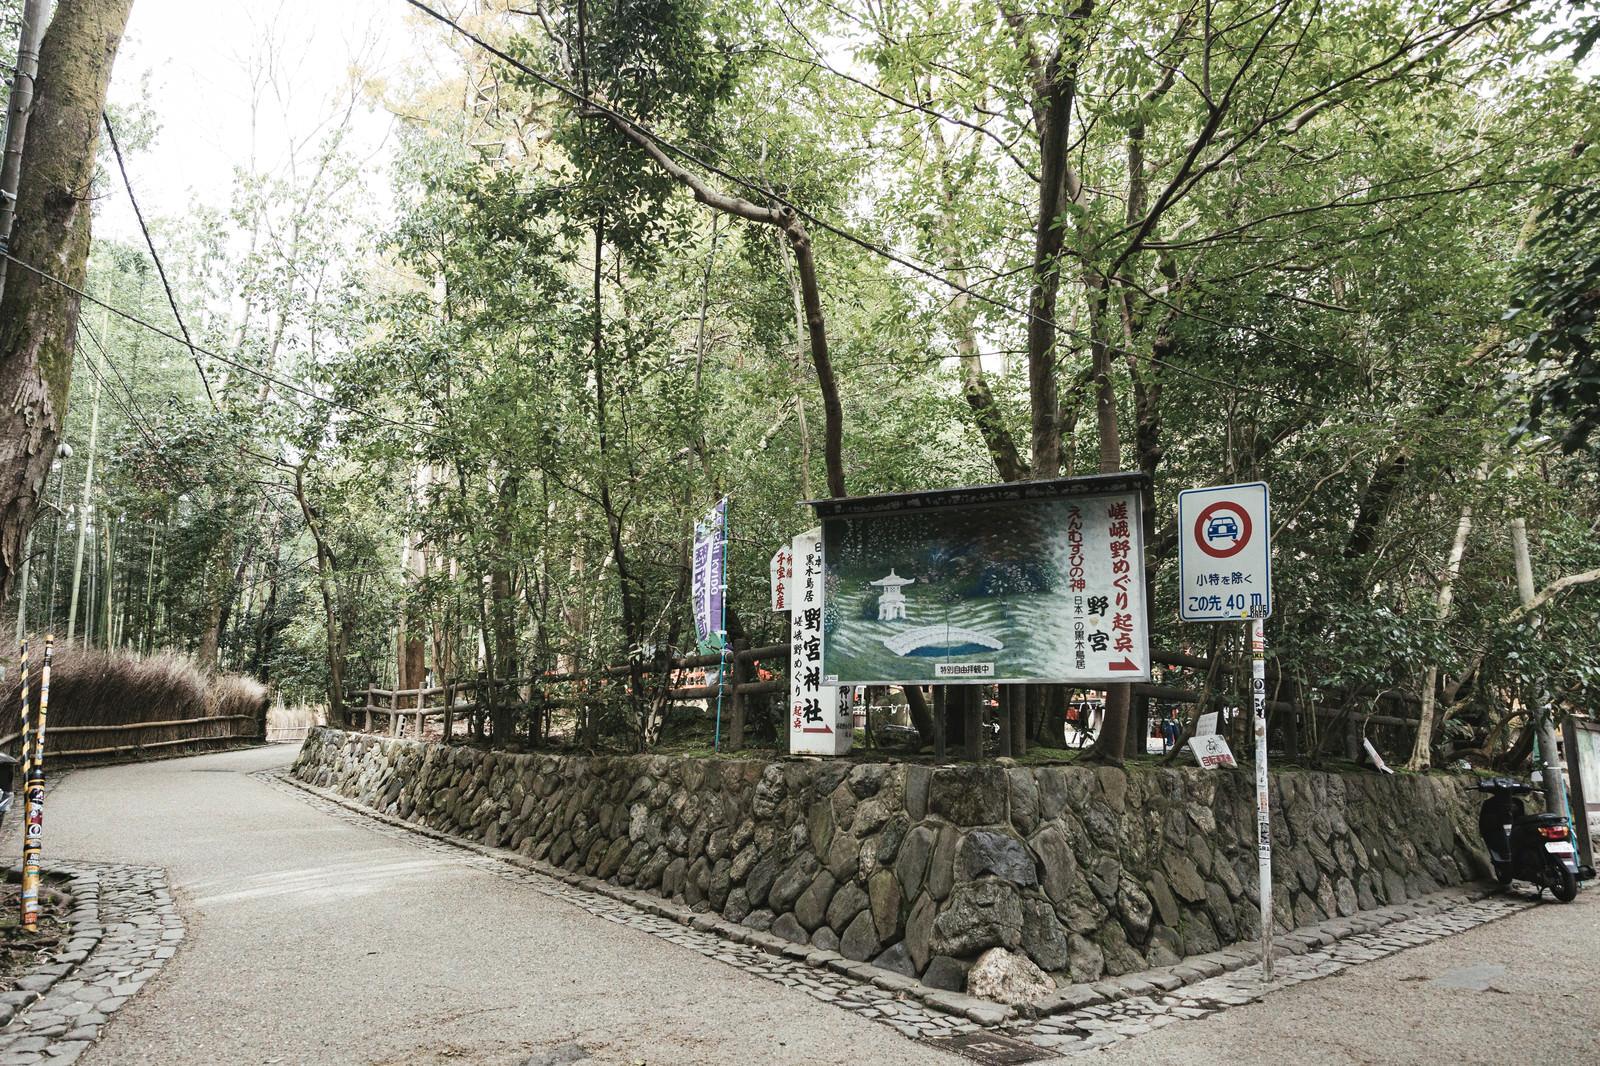 「京都嵐山の野宮神社前」の写真